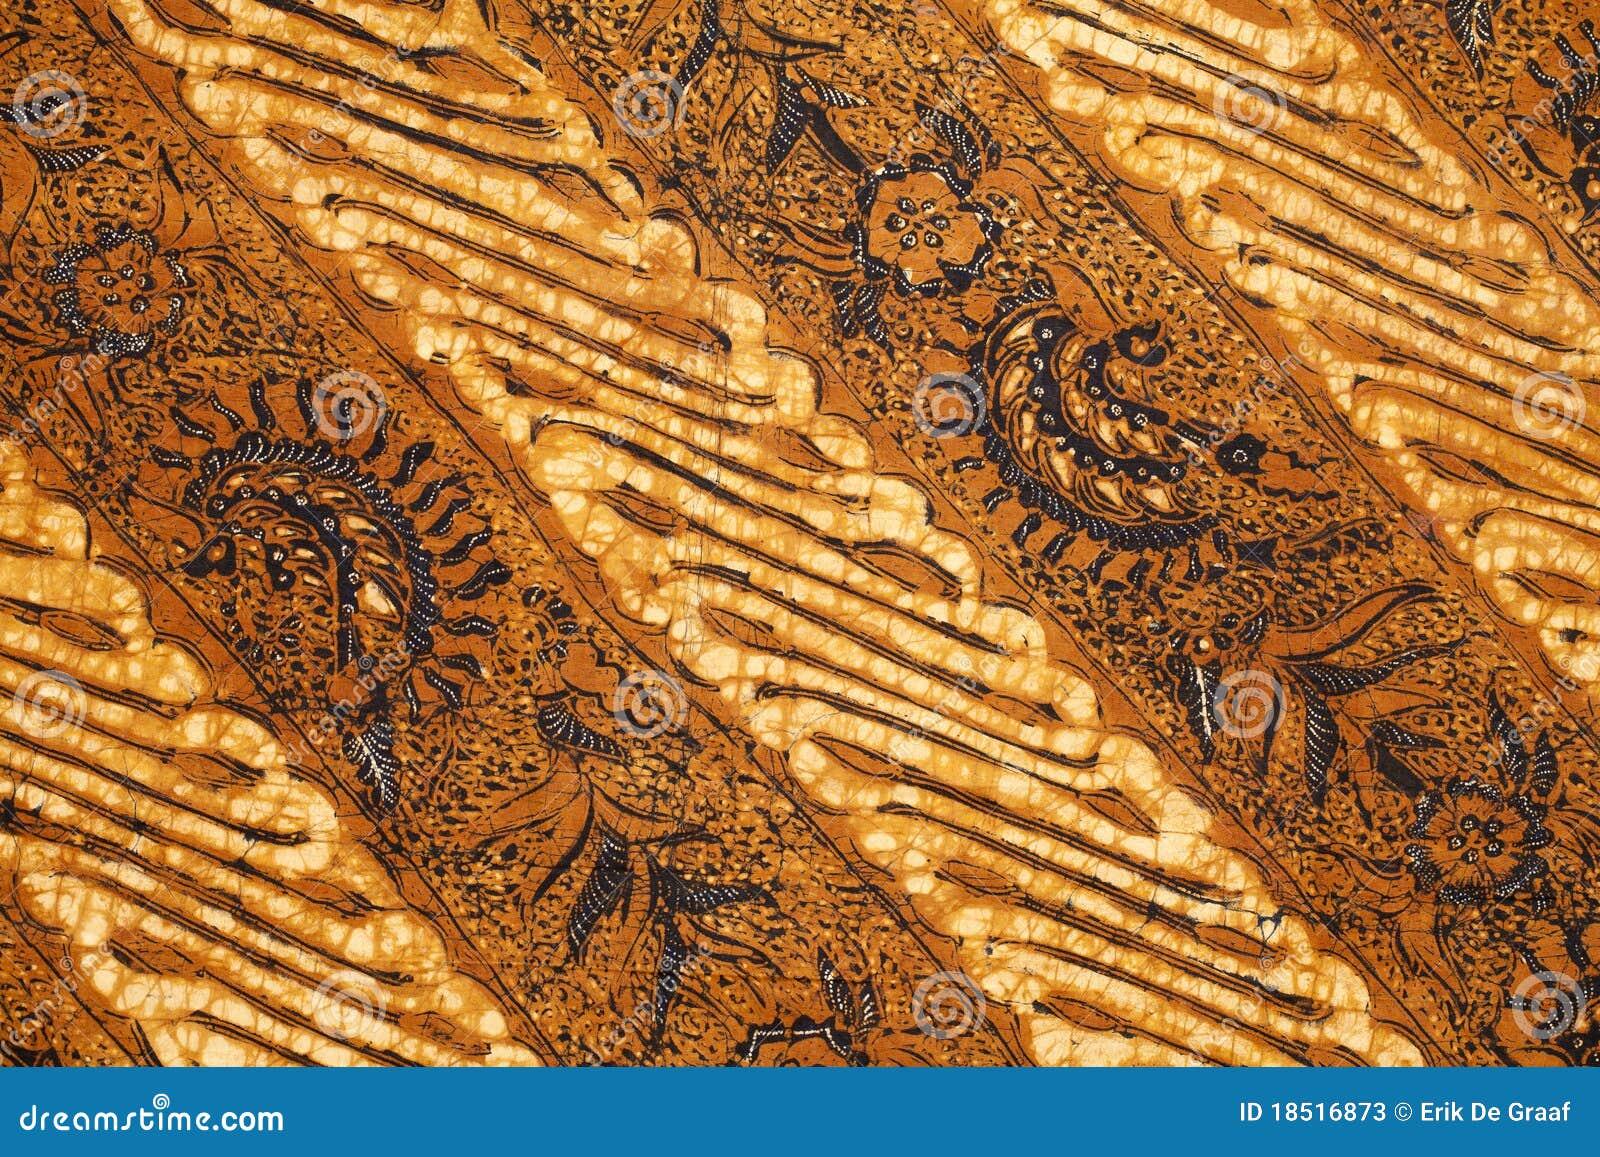 Batik design royalty free stock photos image 29546988 - Batik Design Stock Photos Image 18516873 Wallpaper